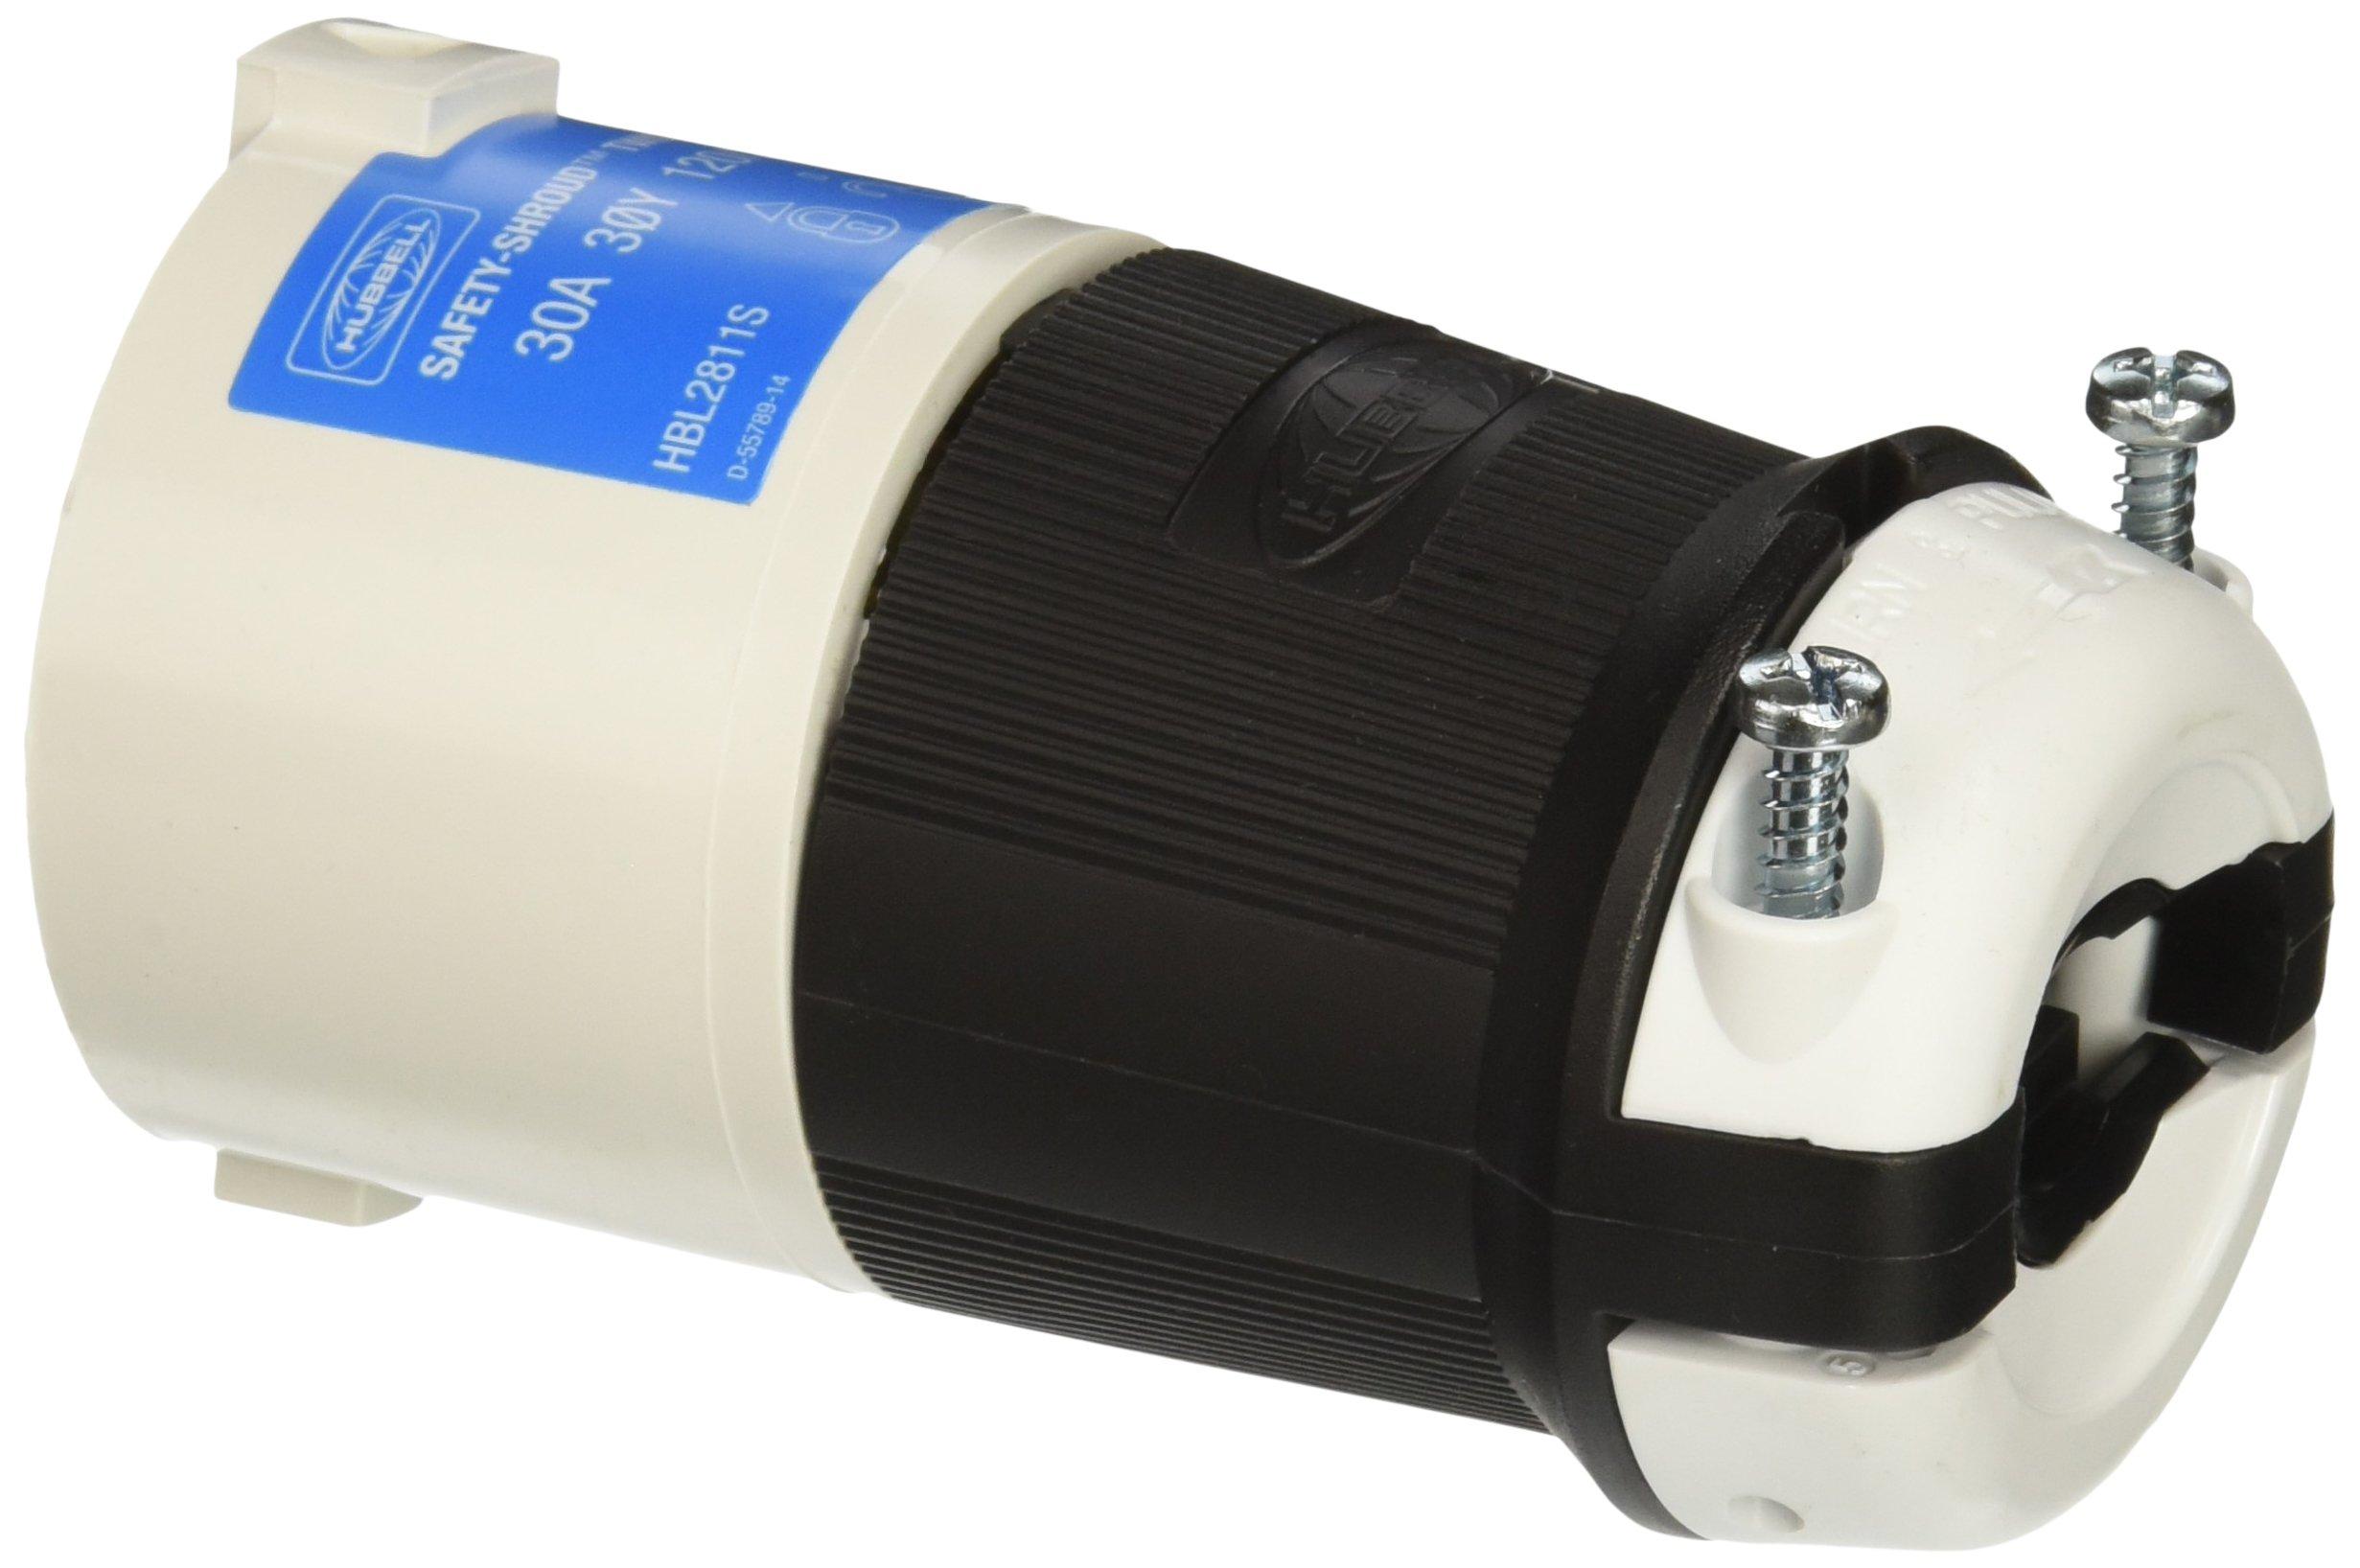 Hubbell HBL2811S Locking Safety Shroud Plug, 30 amp, 3 Phase, 120/208V, L21-30P